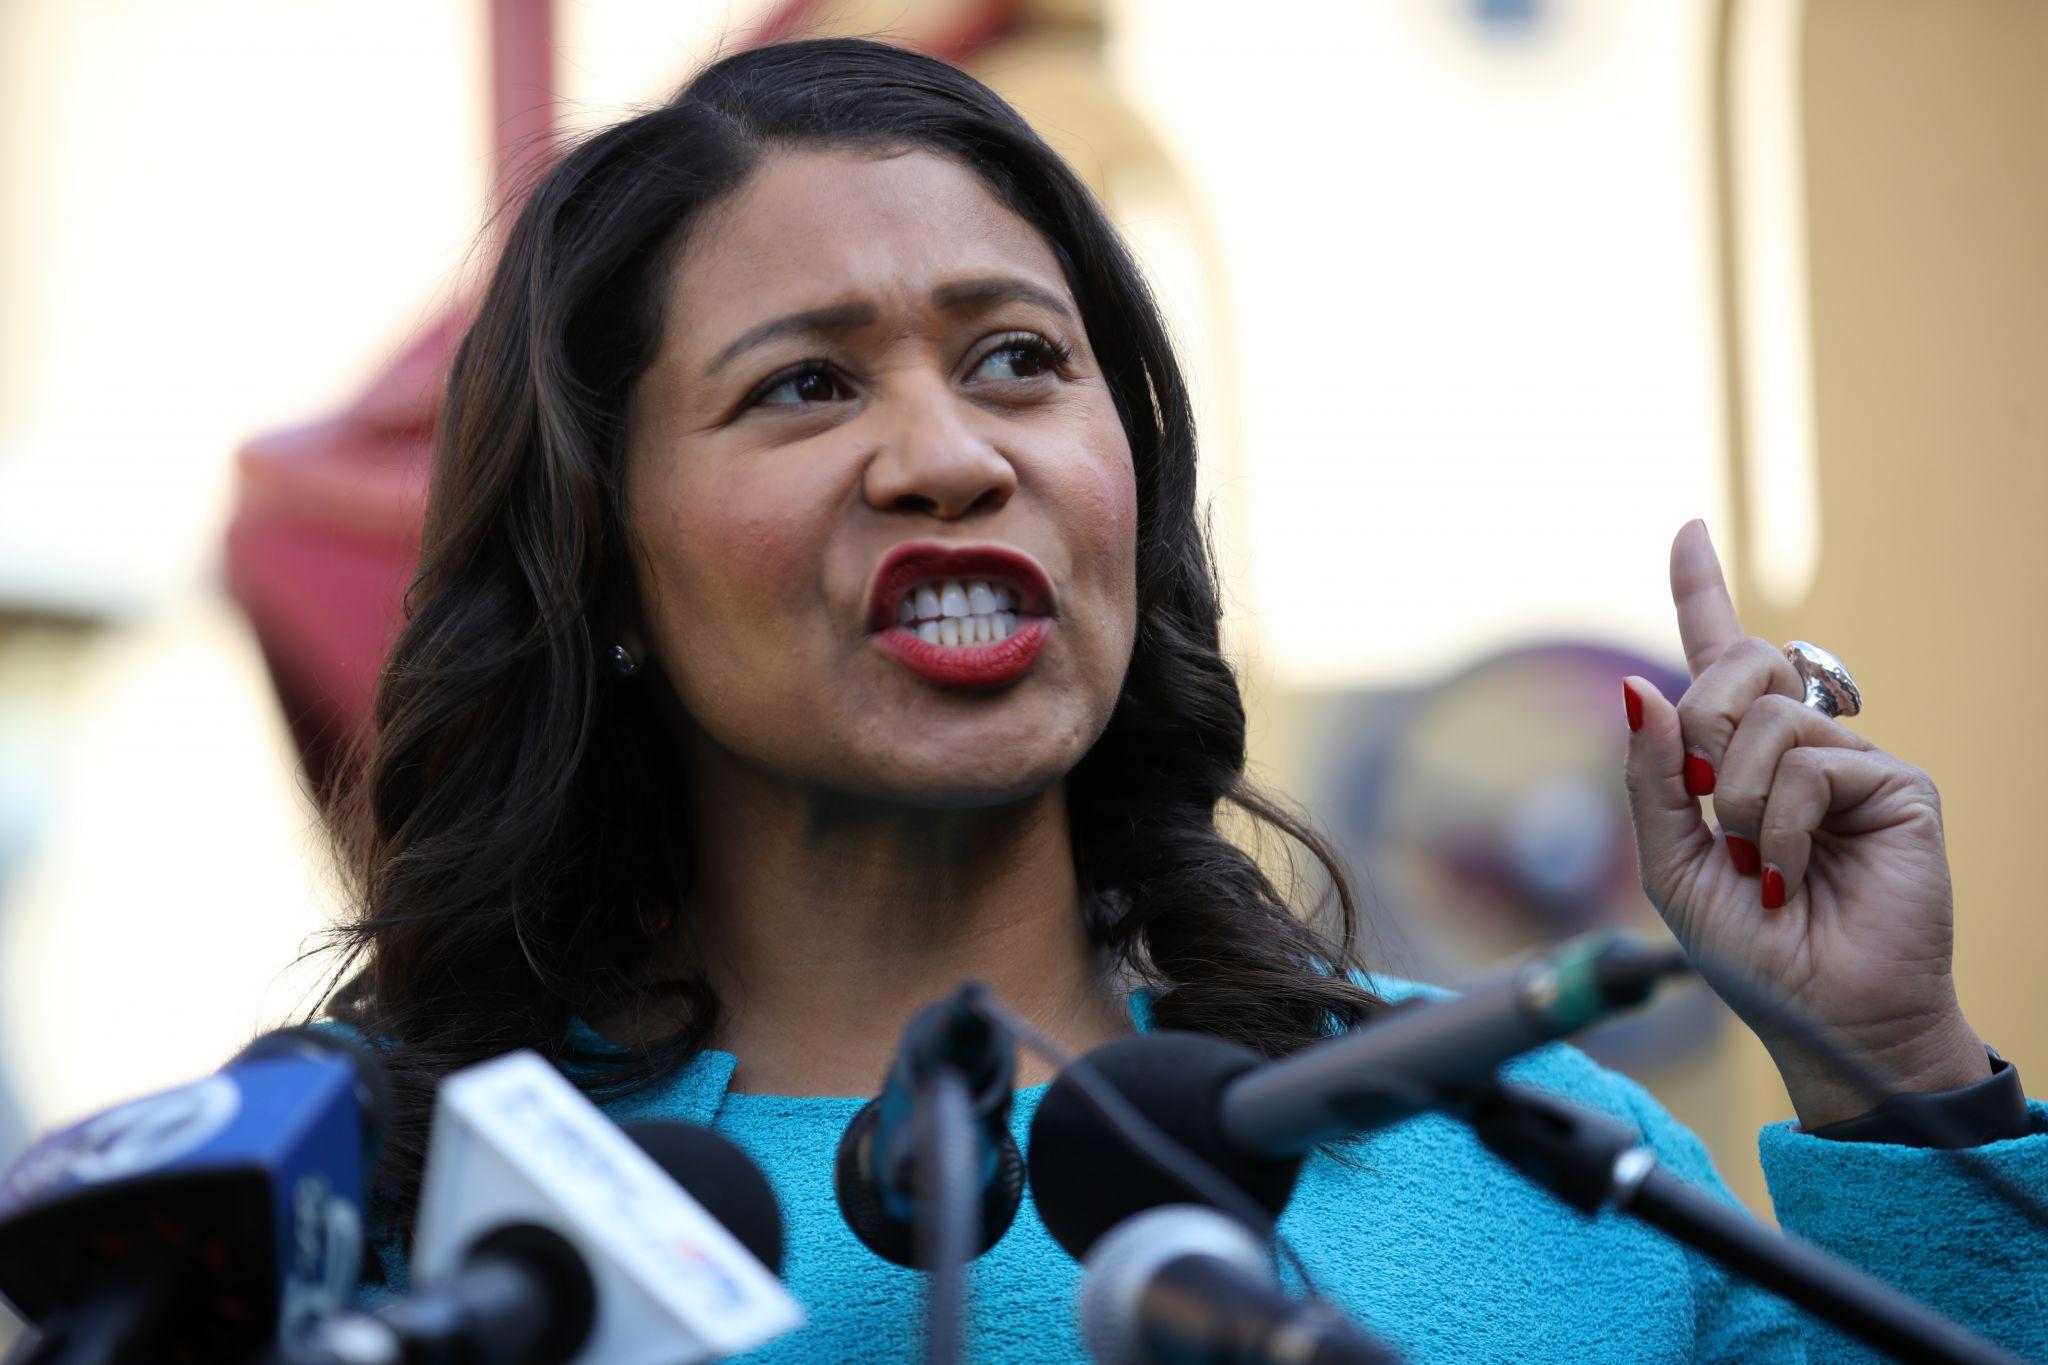 Local emergency declared in San Francisco amid coronavirus concerns